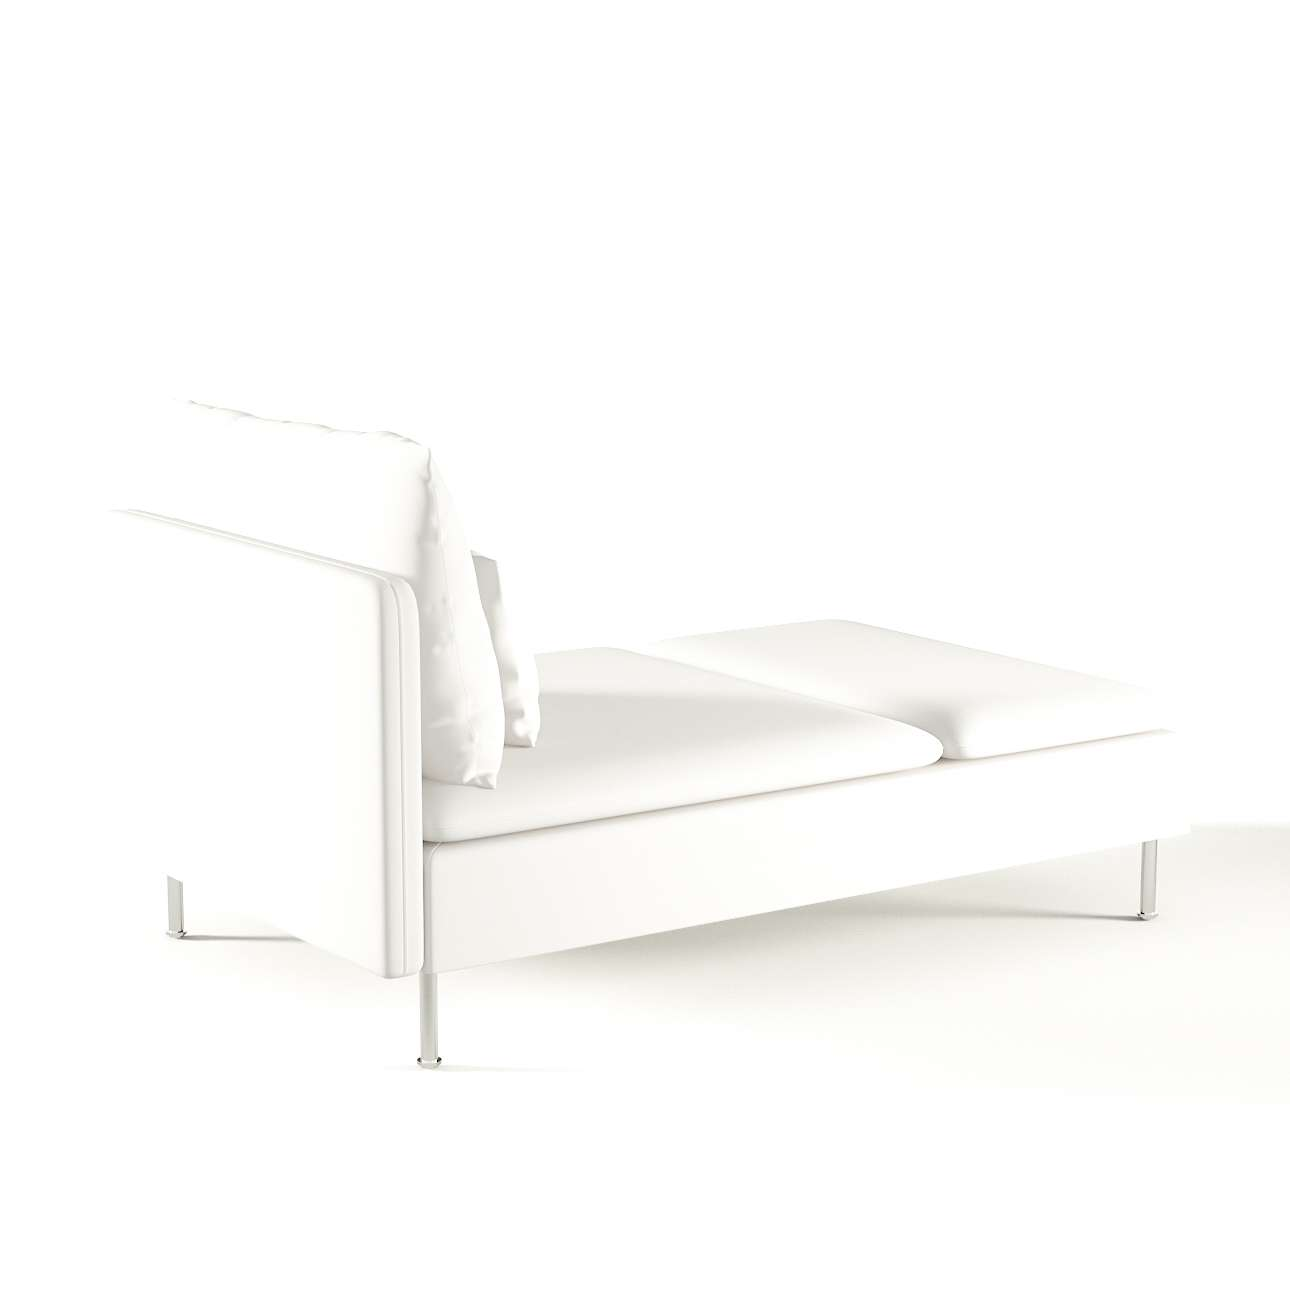 s derhamn bezug f r recamiere weiss dekoria. Black Bedroom Furniture Sets. Home Design Ideas